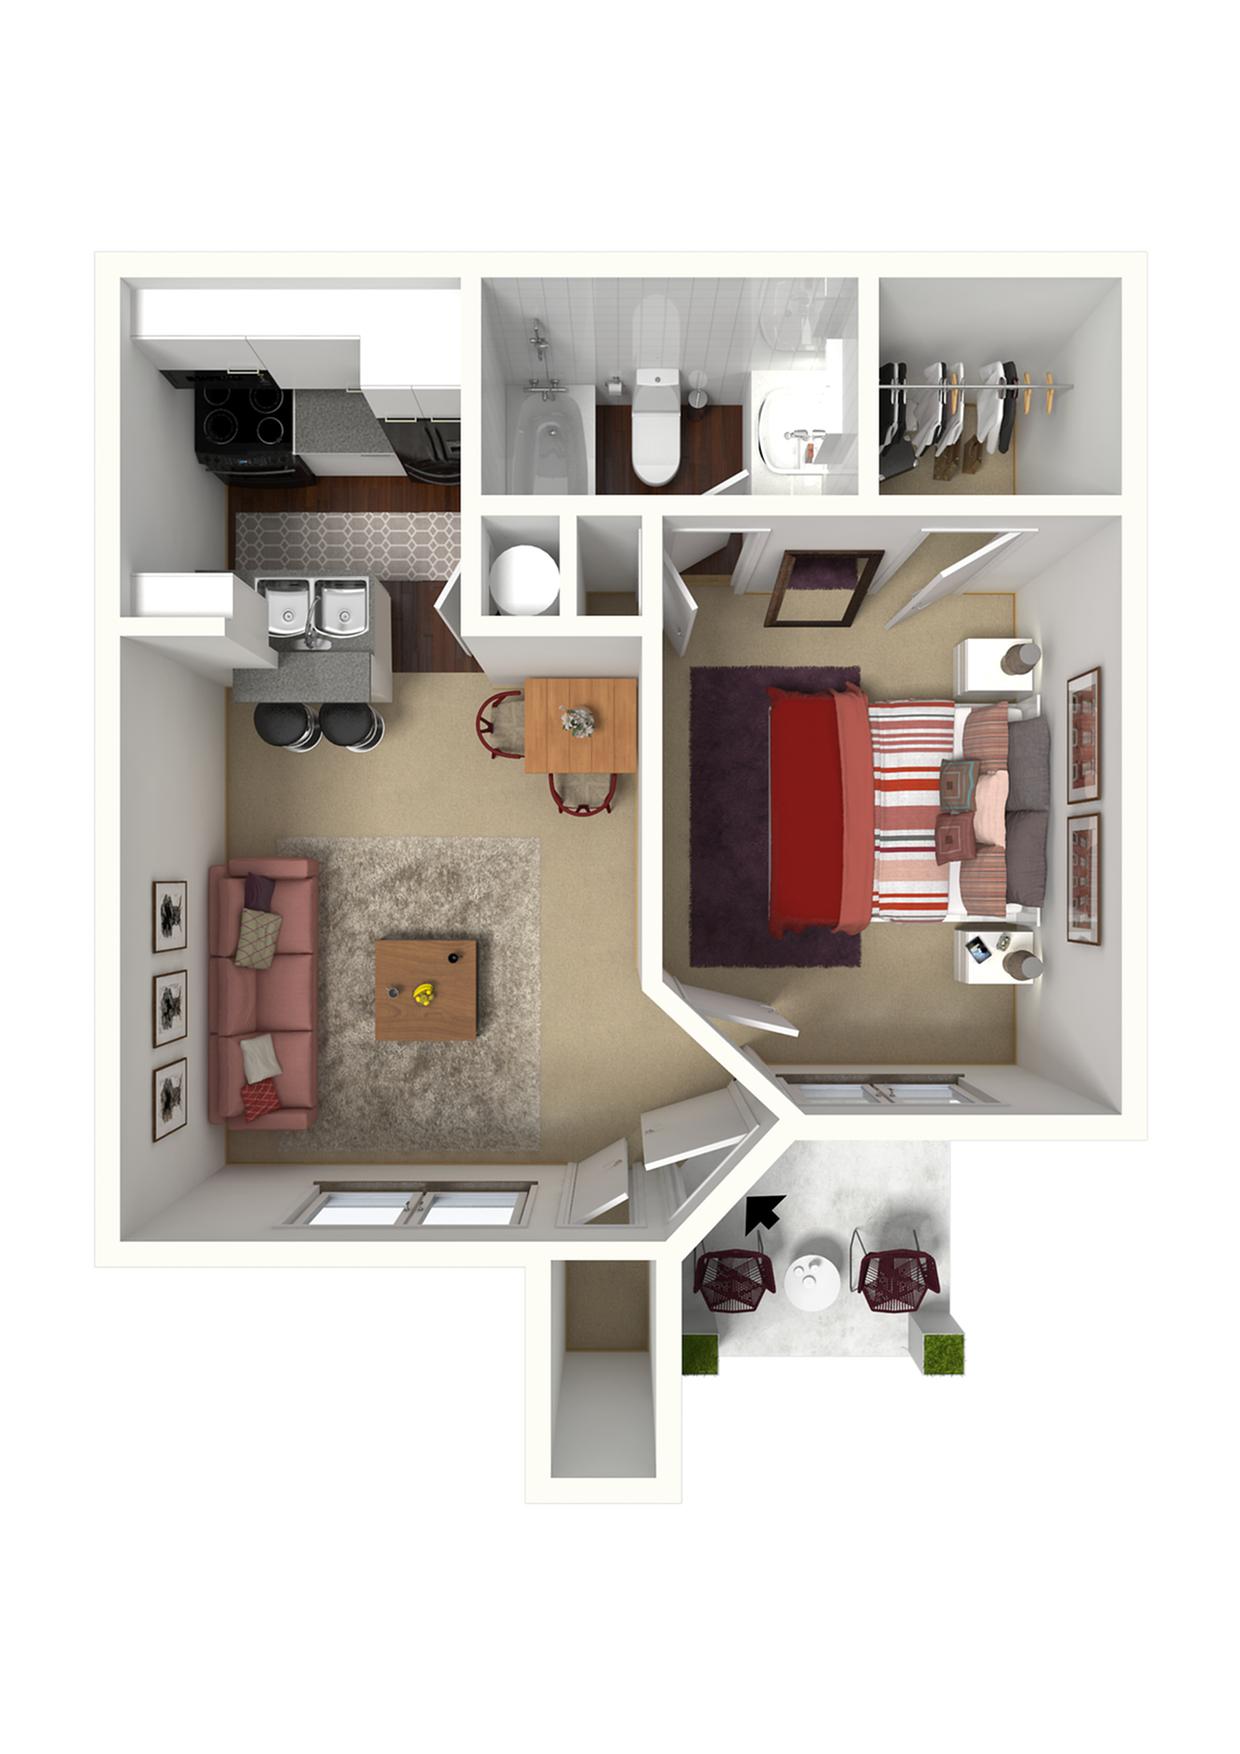 1 Bedroom Jr. - 520 SqFt